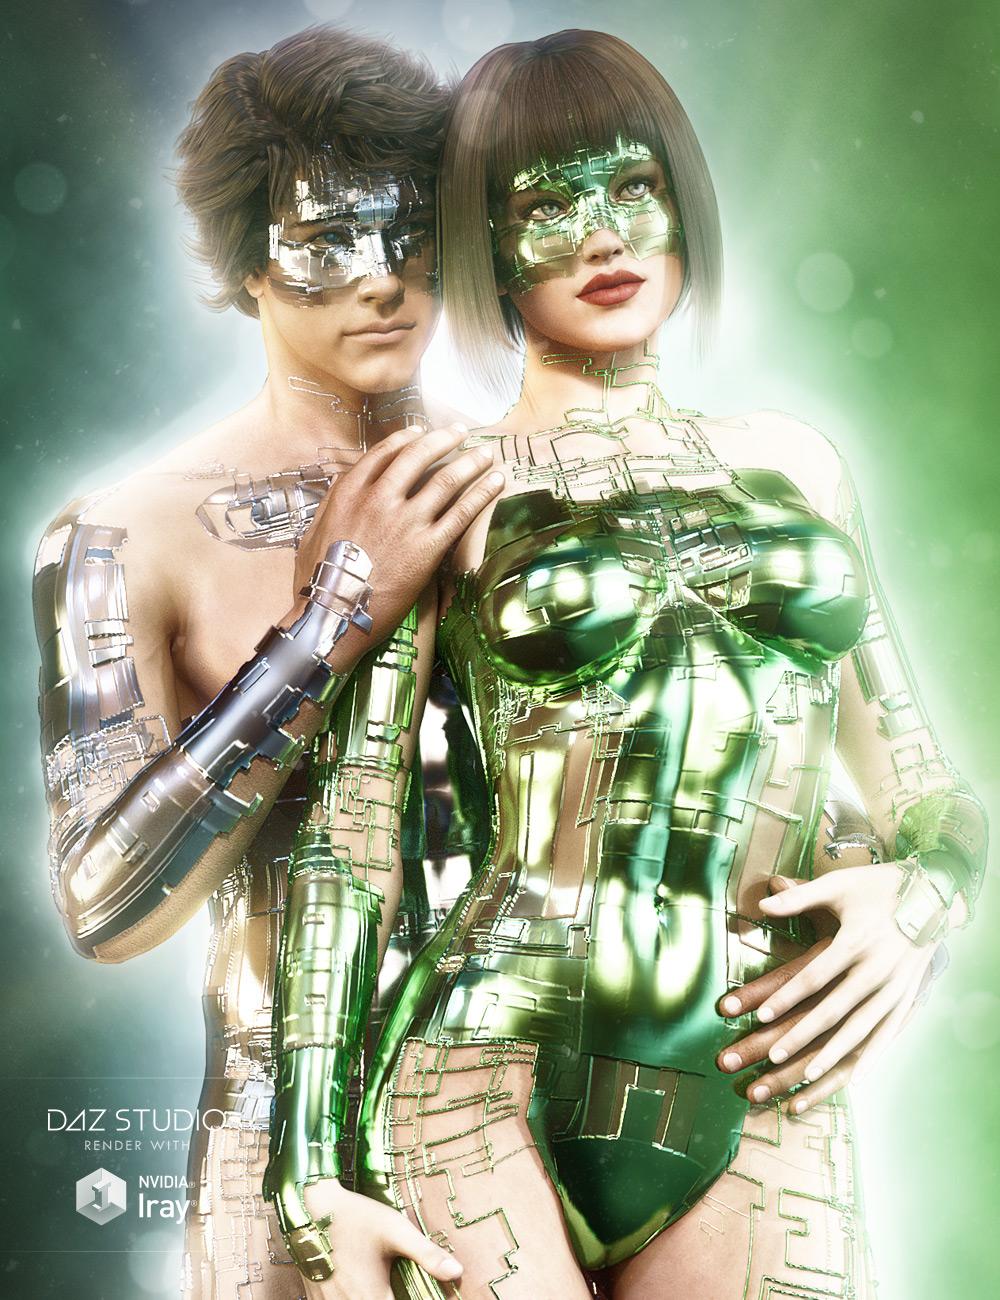 Jepe's Body Jewels 3 for Daz Studio by: Jepe, 3D Models by Daz 3D